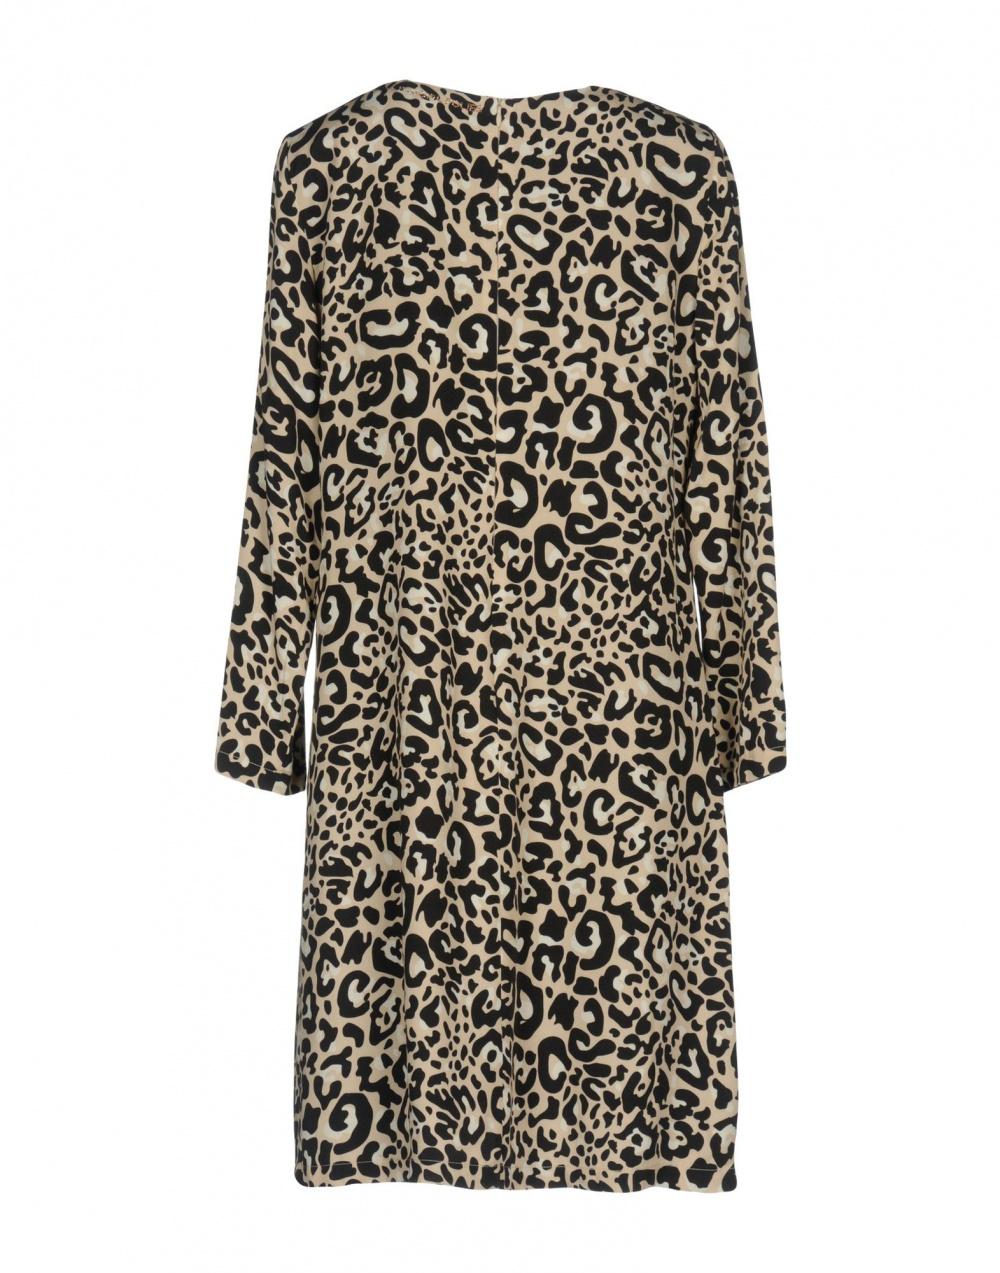 Платье Blugirl Folies, размер 42 it ( 44, 46 )